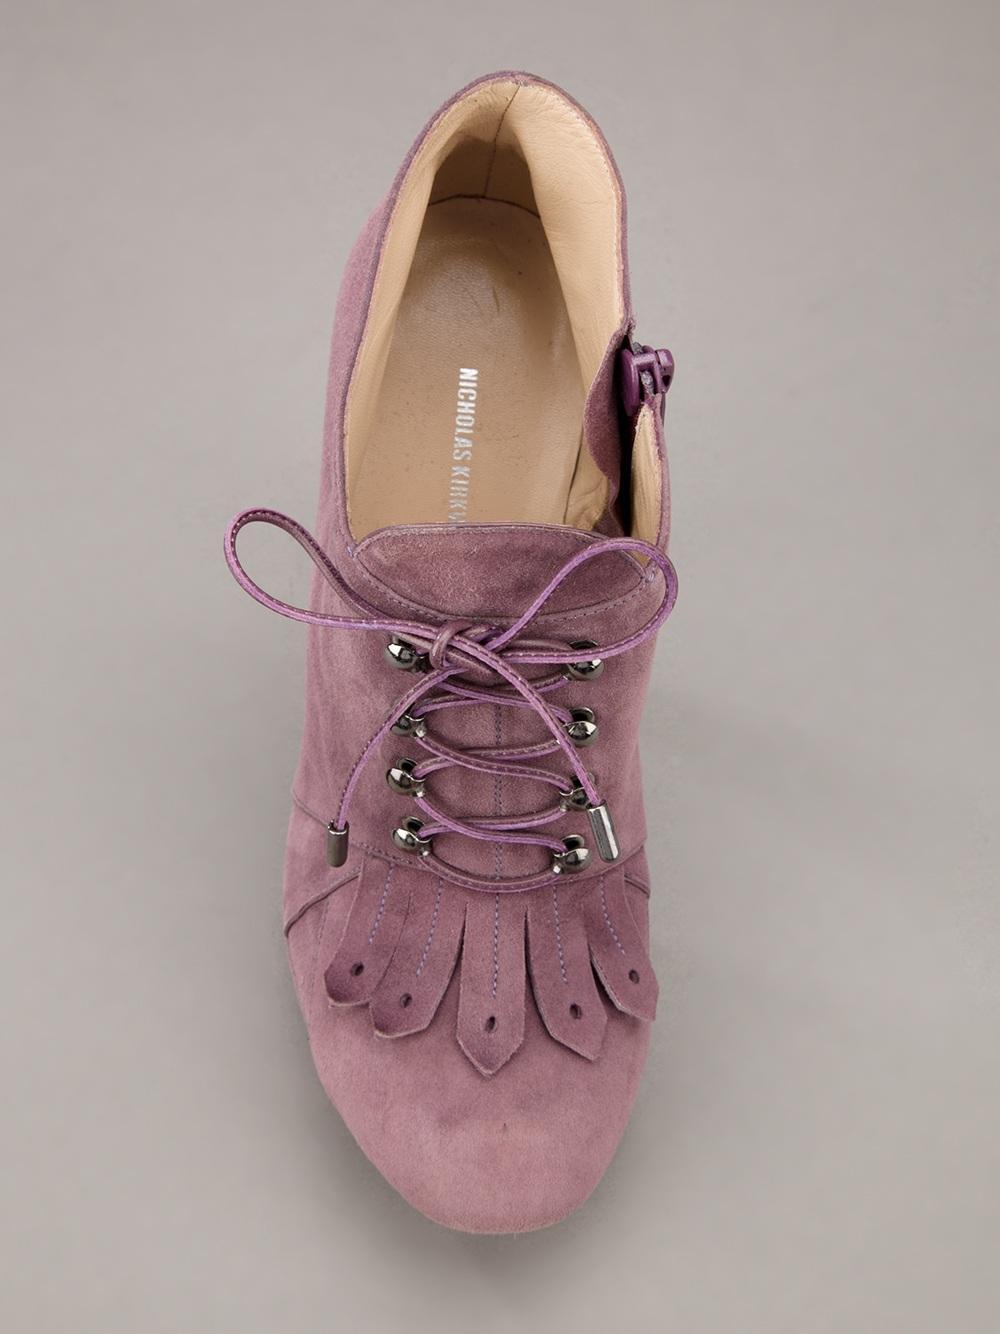 Nicholas Kirkwood Fringed Ankle Boot In Pink Amp Purple